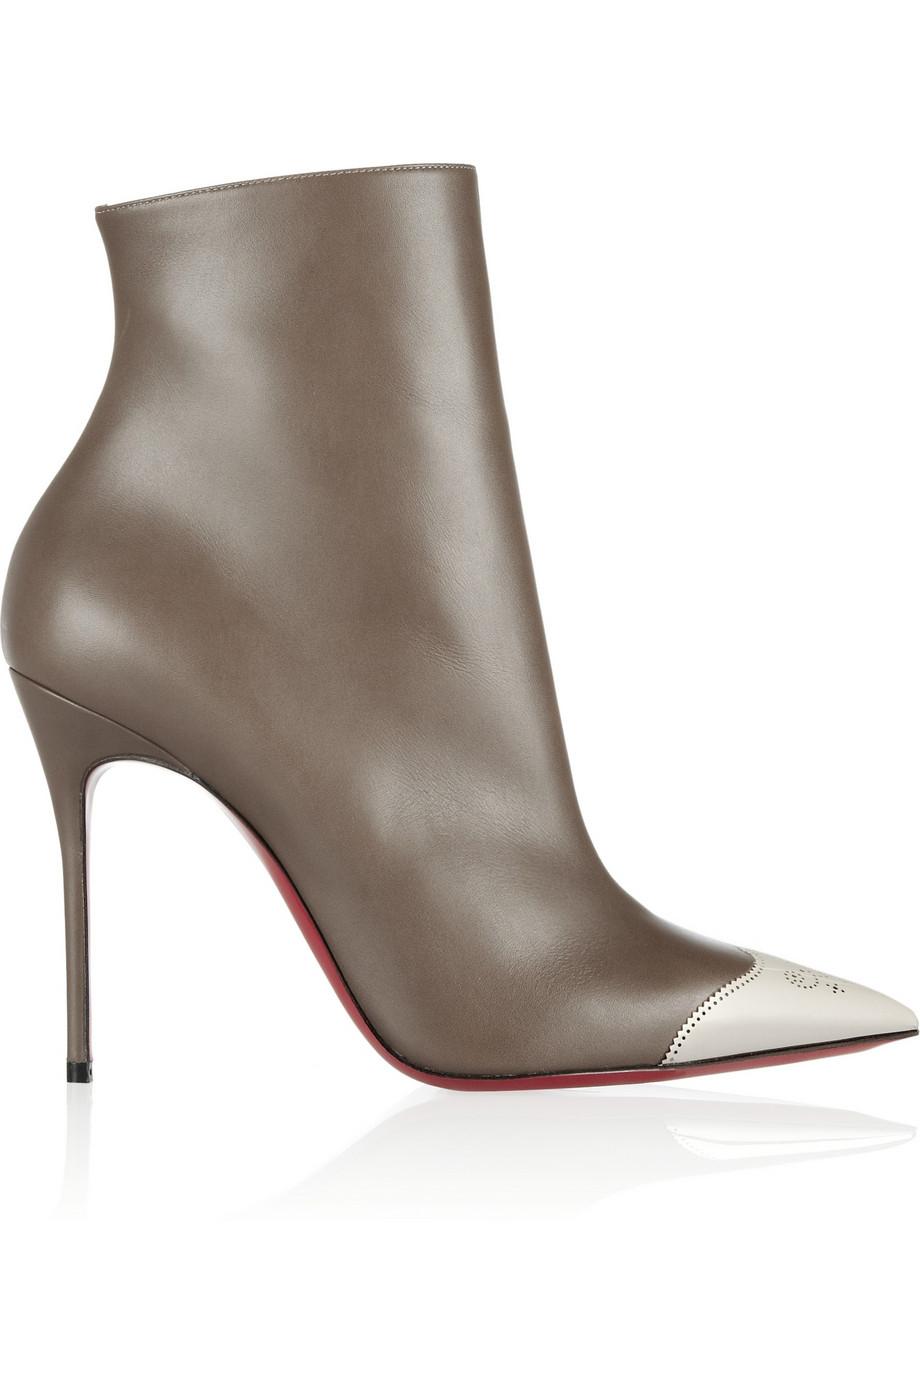 Christian Louboutin Women's Eloise Almond Toe Bootie Bo395G